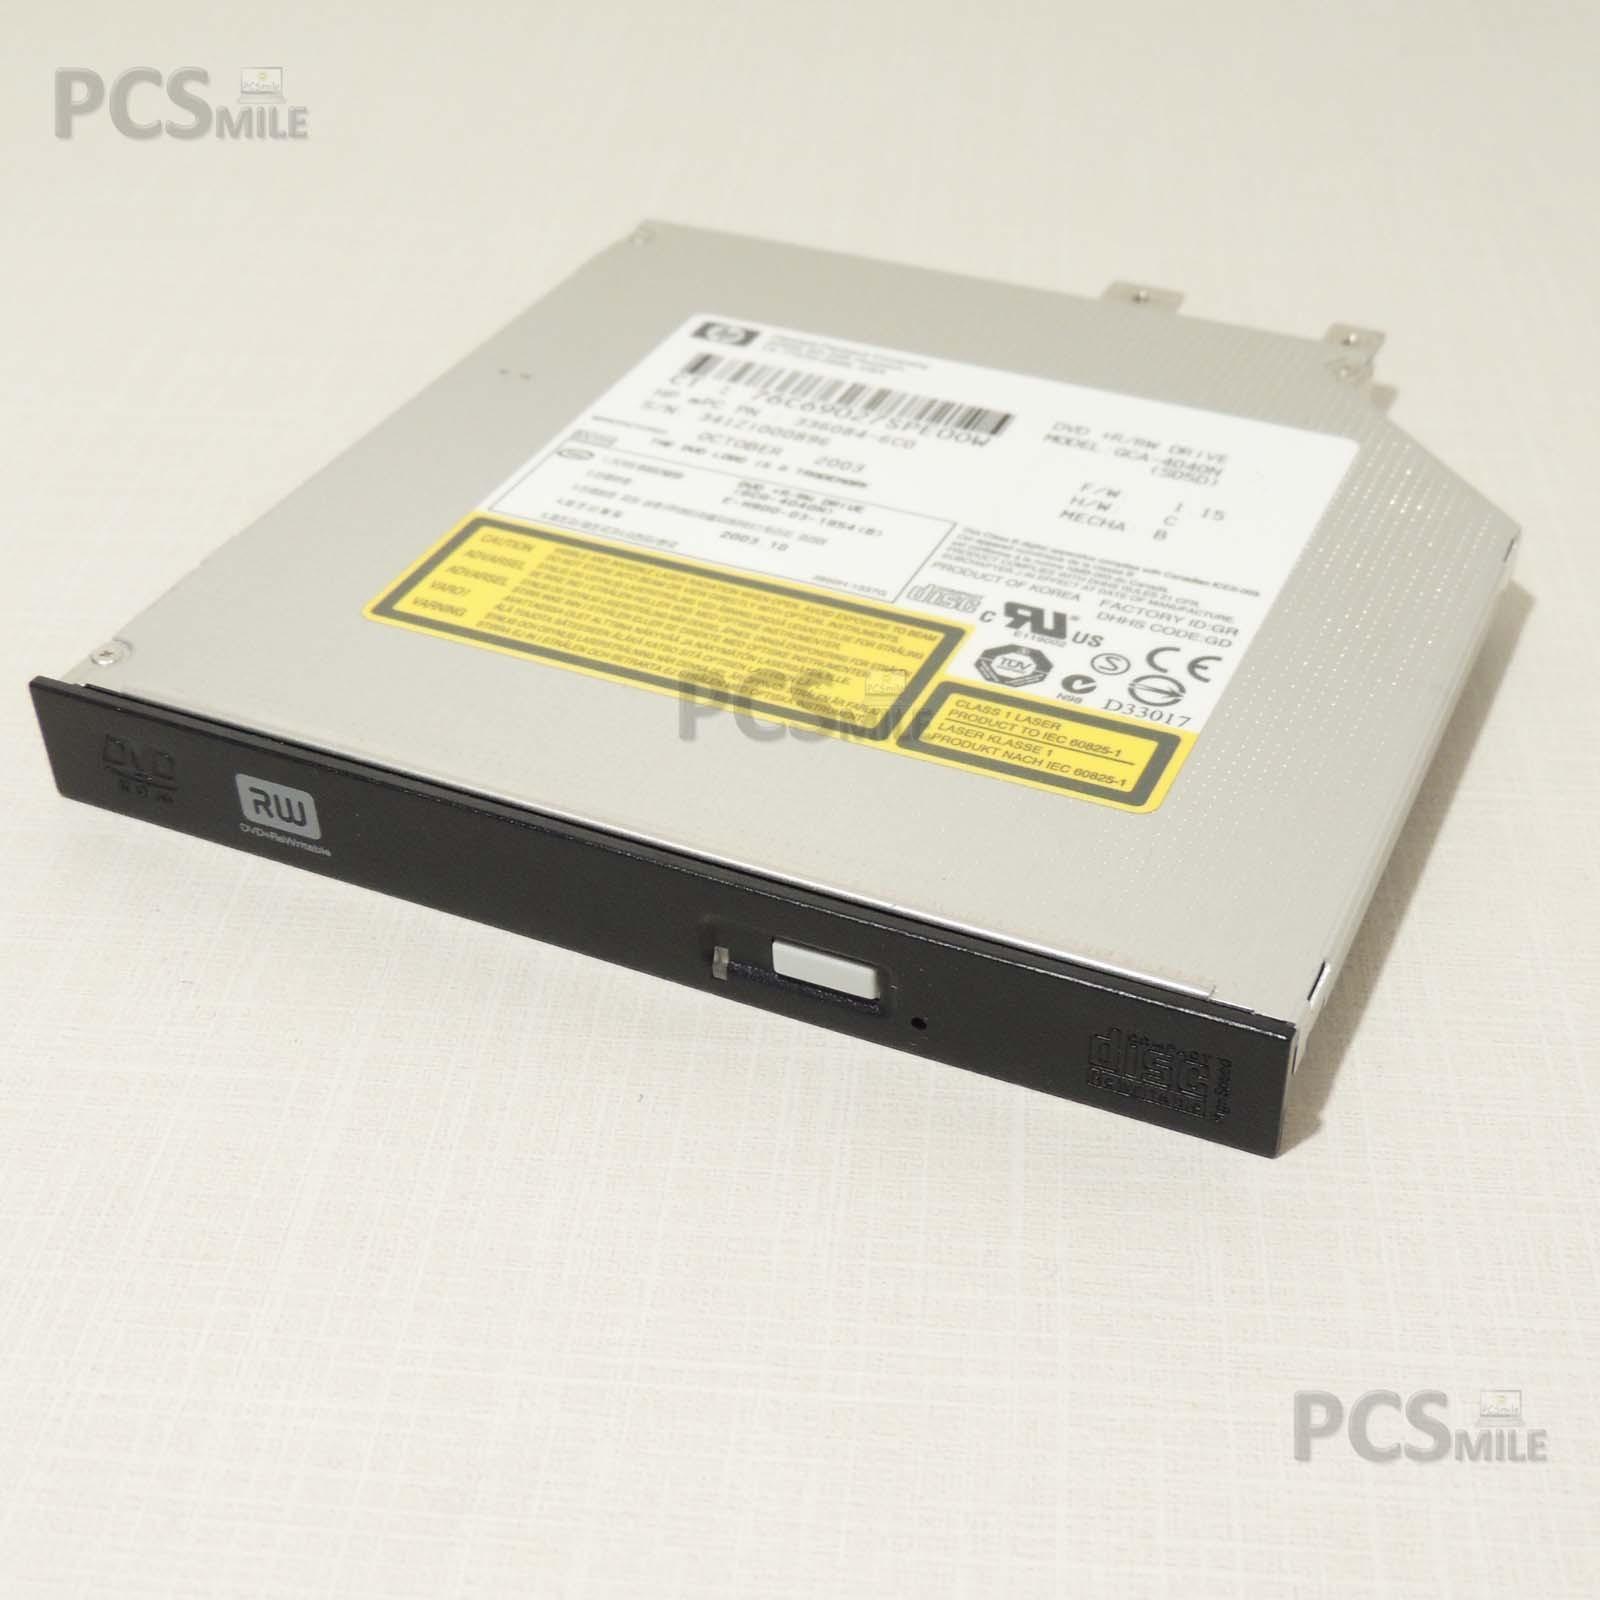 HP Pavilion ZE5500 Lettore CD DVD GCA-4040N 336084-6C0 MASCHERINA